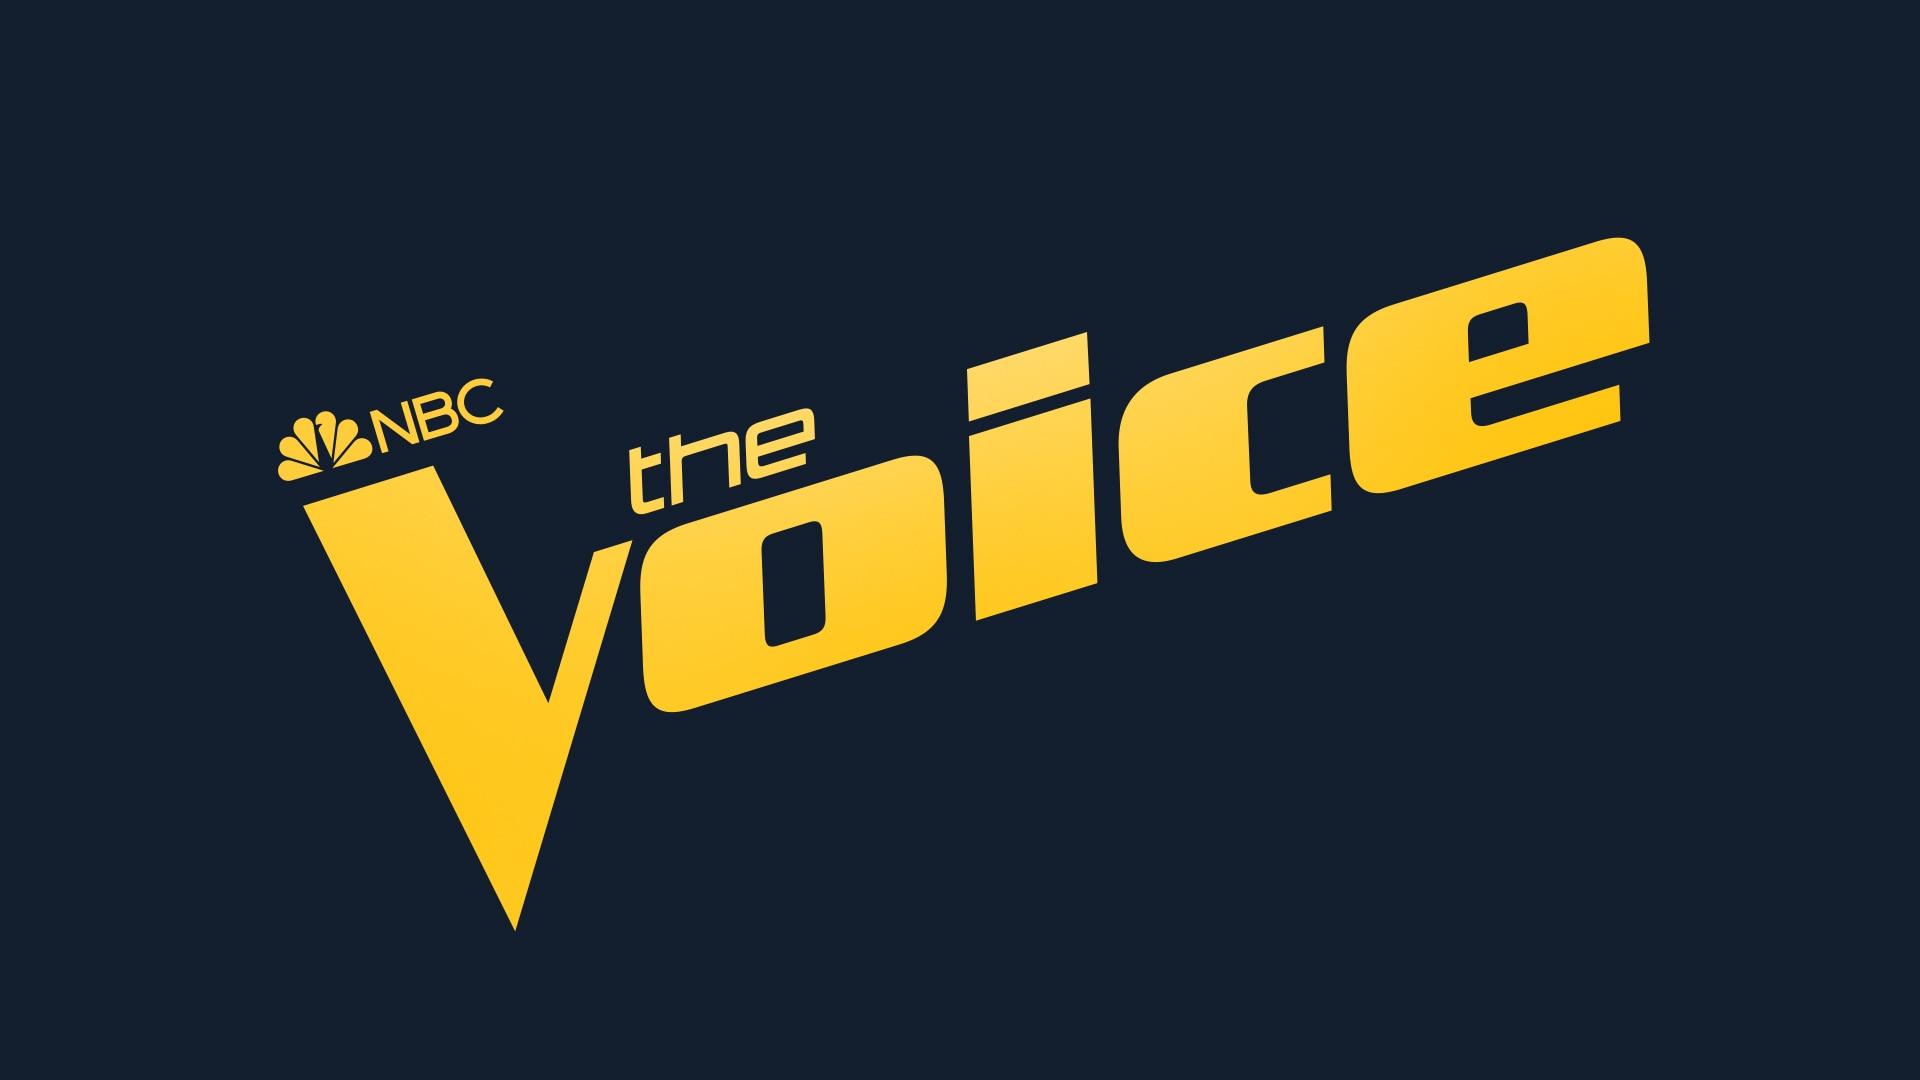 The Voice - NBC.com